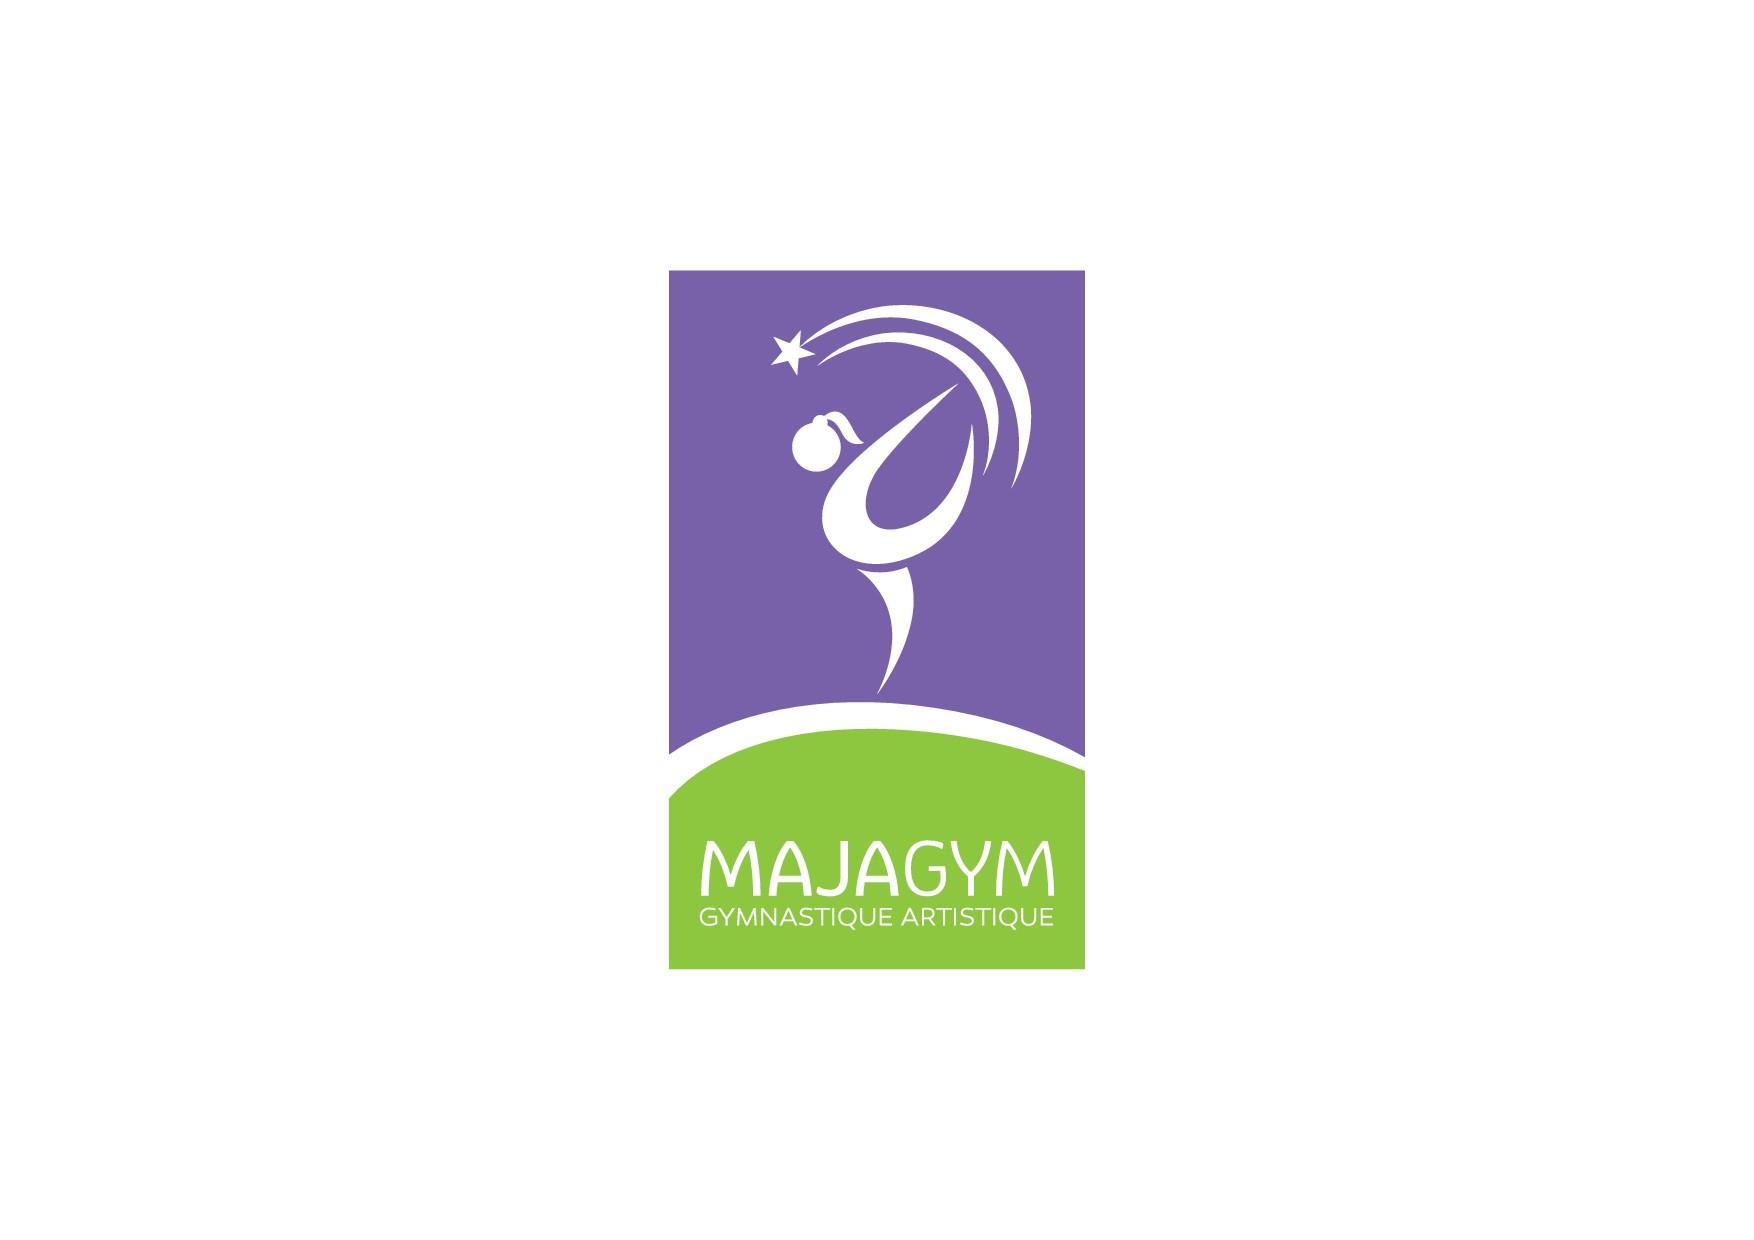 Majagym logo 2nd version